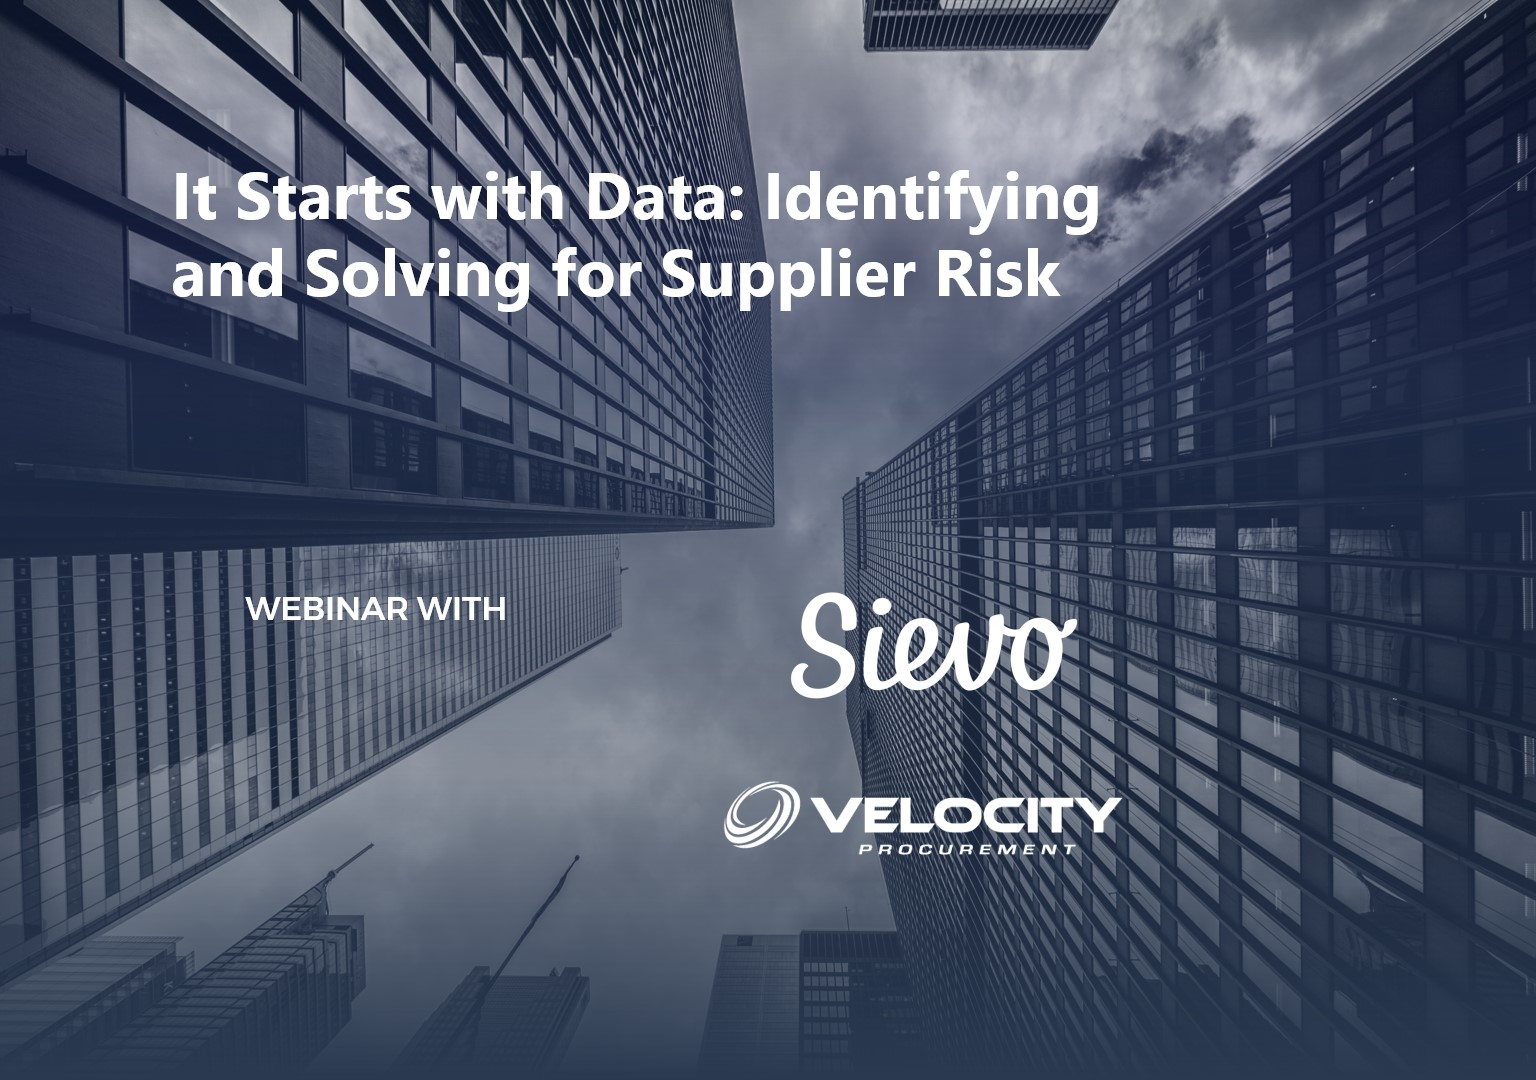 Velocity Webinar